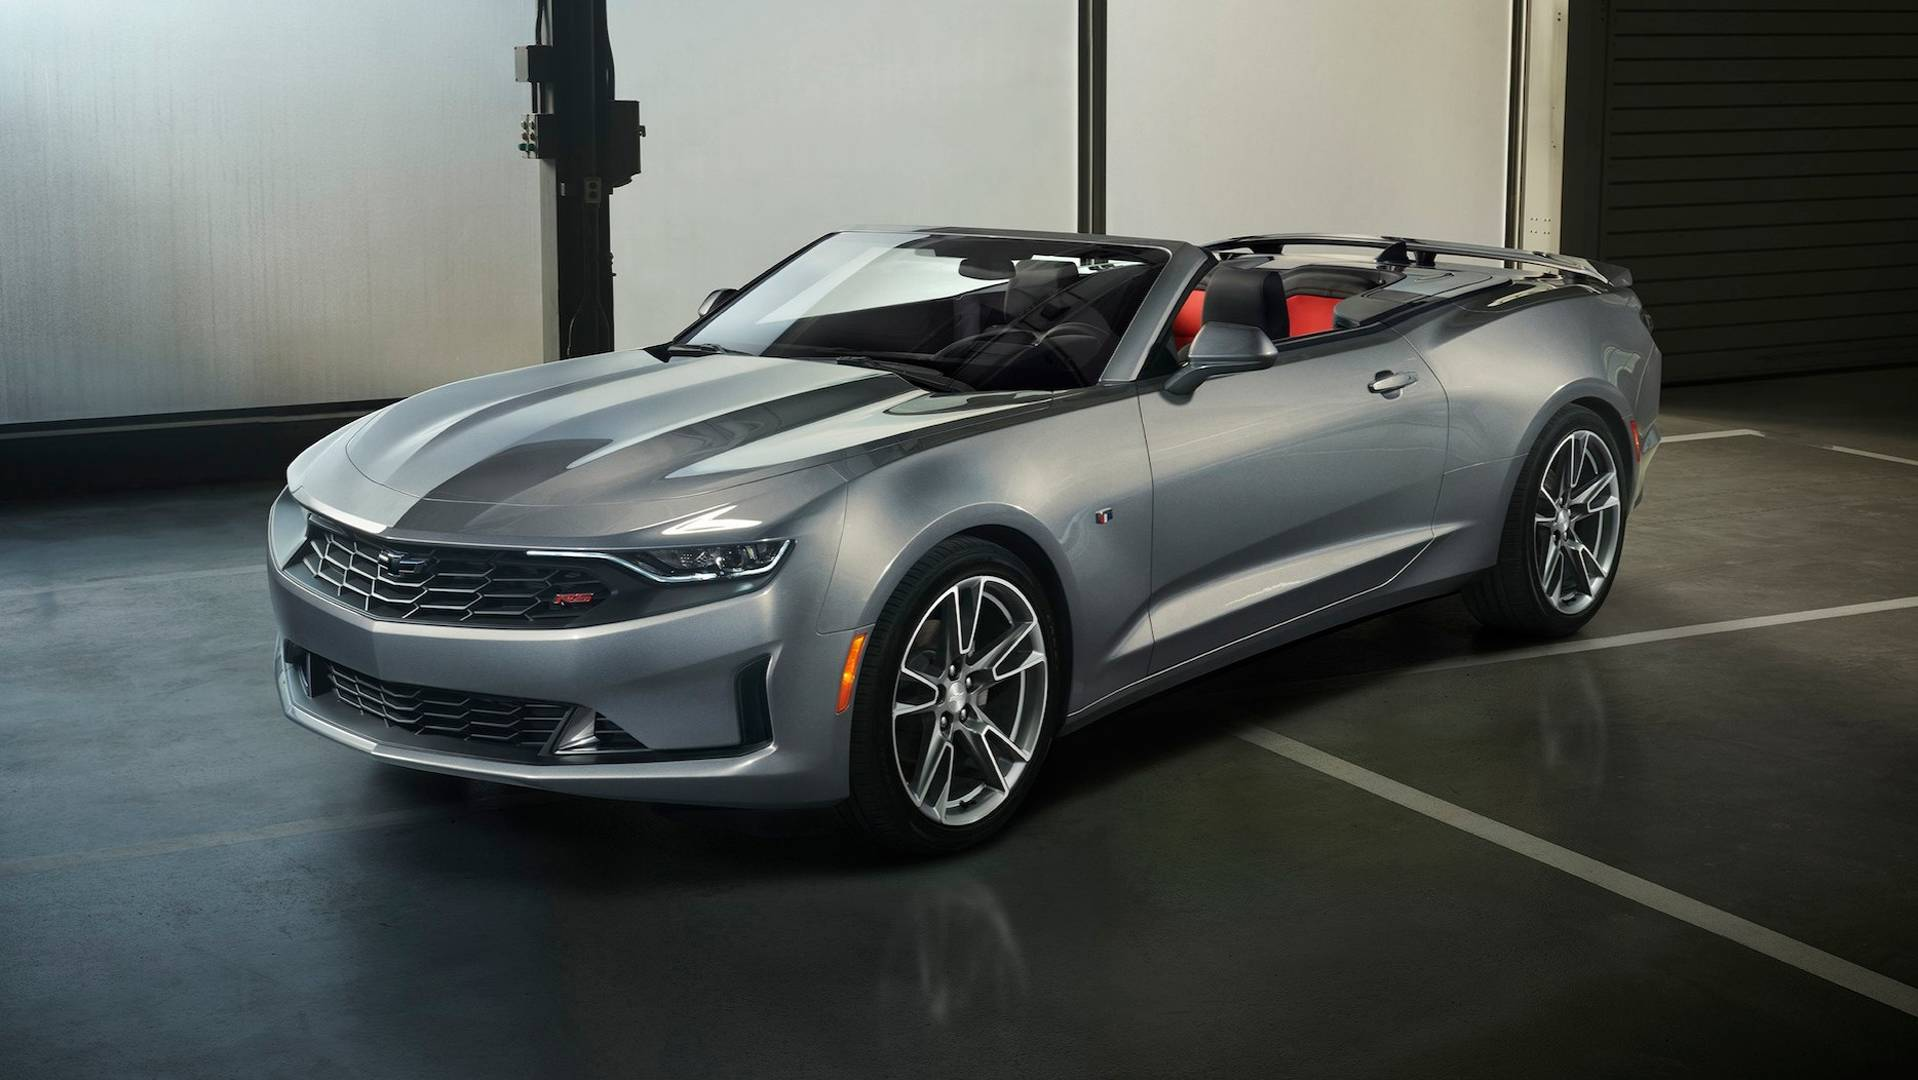 2015 Chevy Camaro Imagined Is It A Batmobile Autoevolution